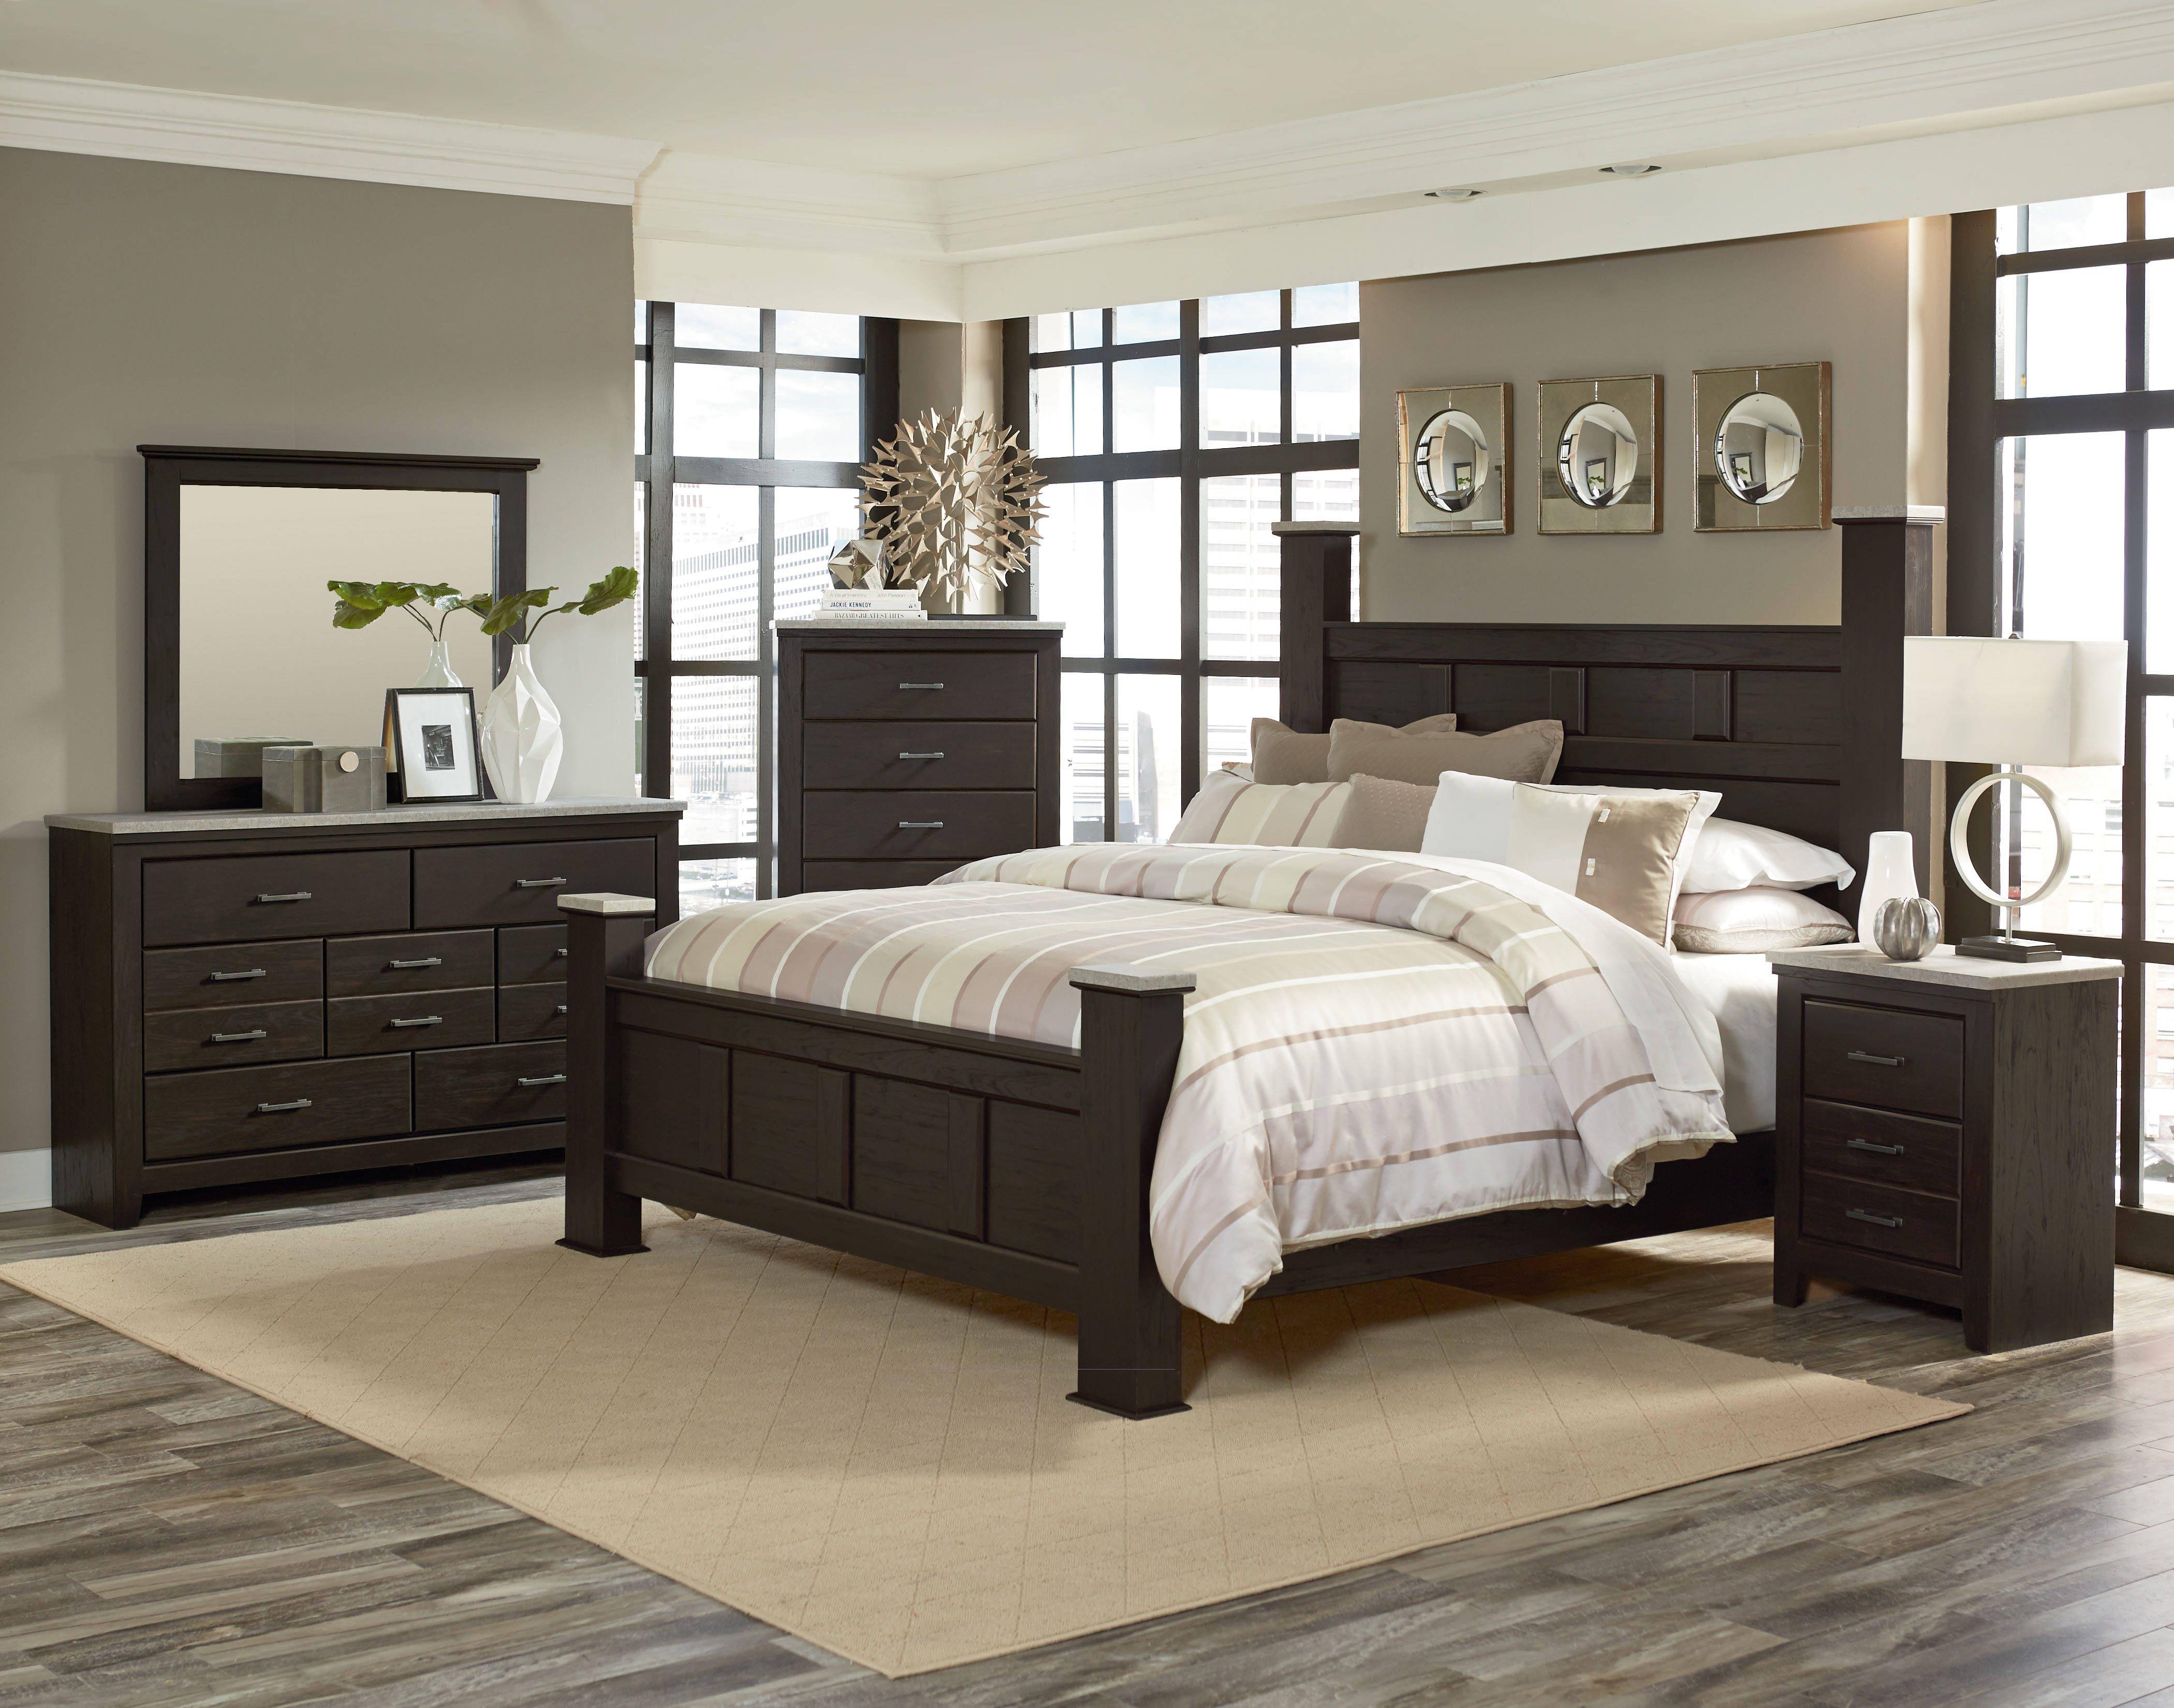 29+ Standard furniture bedroom set ideas in 2021